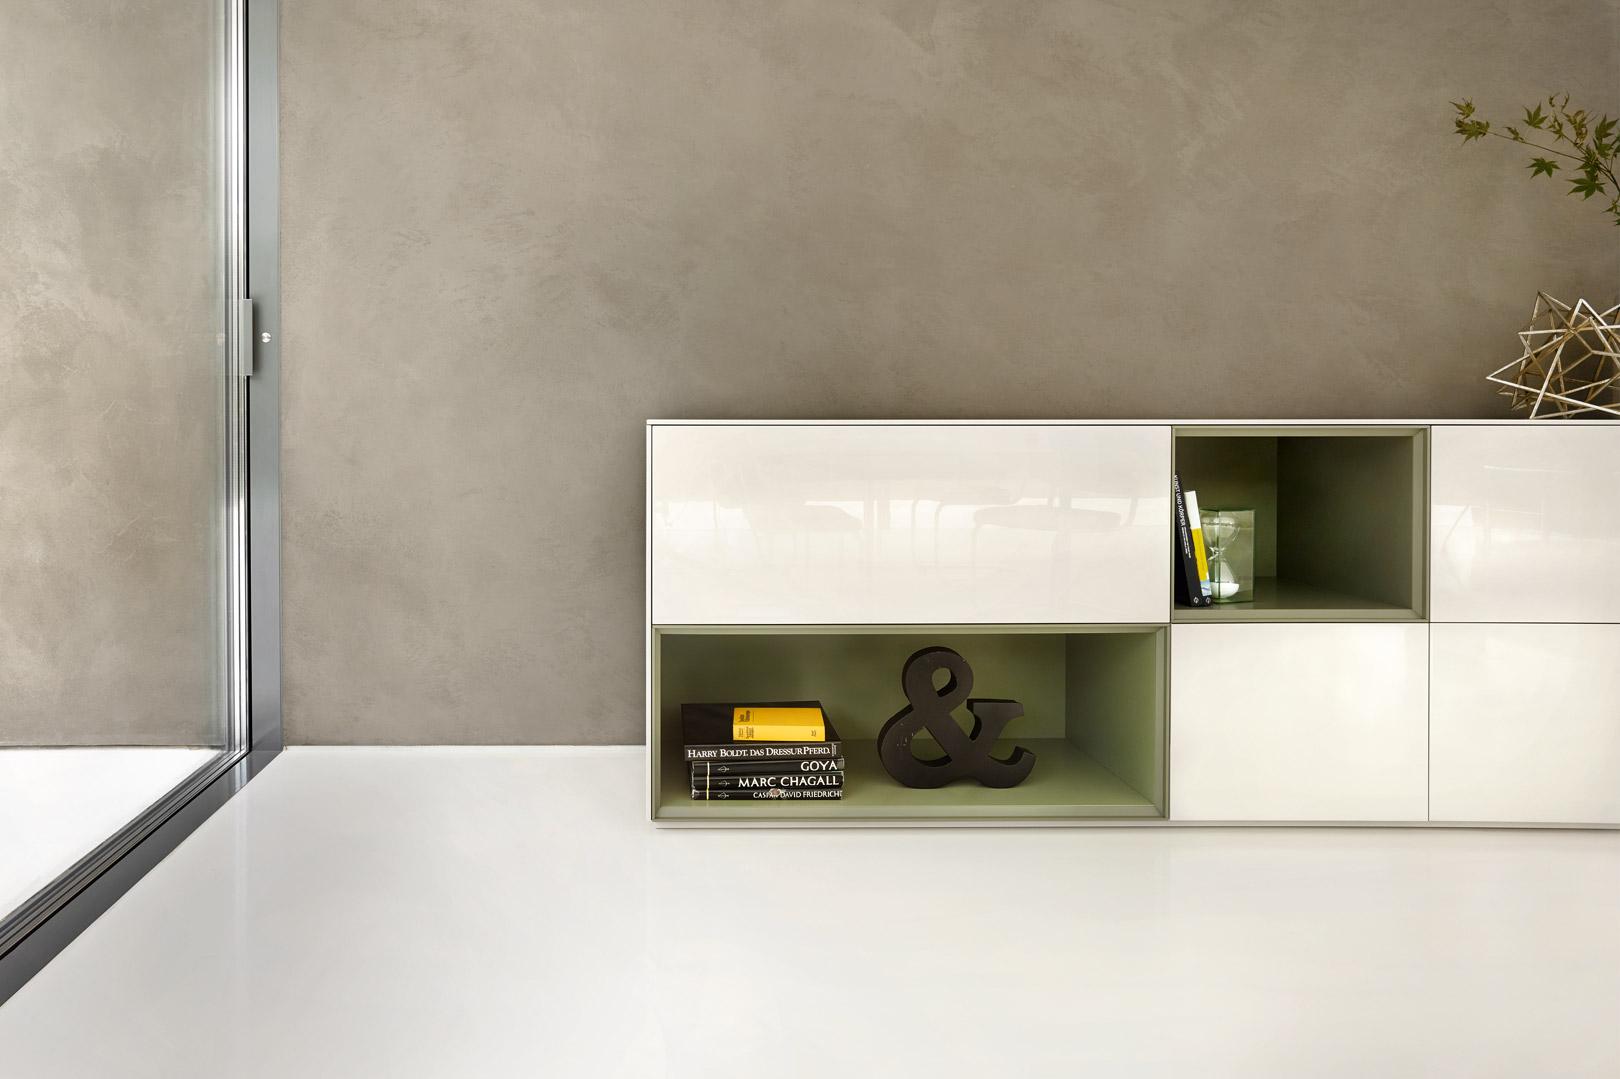 piure-line-sfeer-1620x1079 - Jan Luppes interieurs & Melles interieur